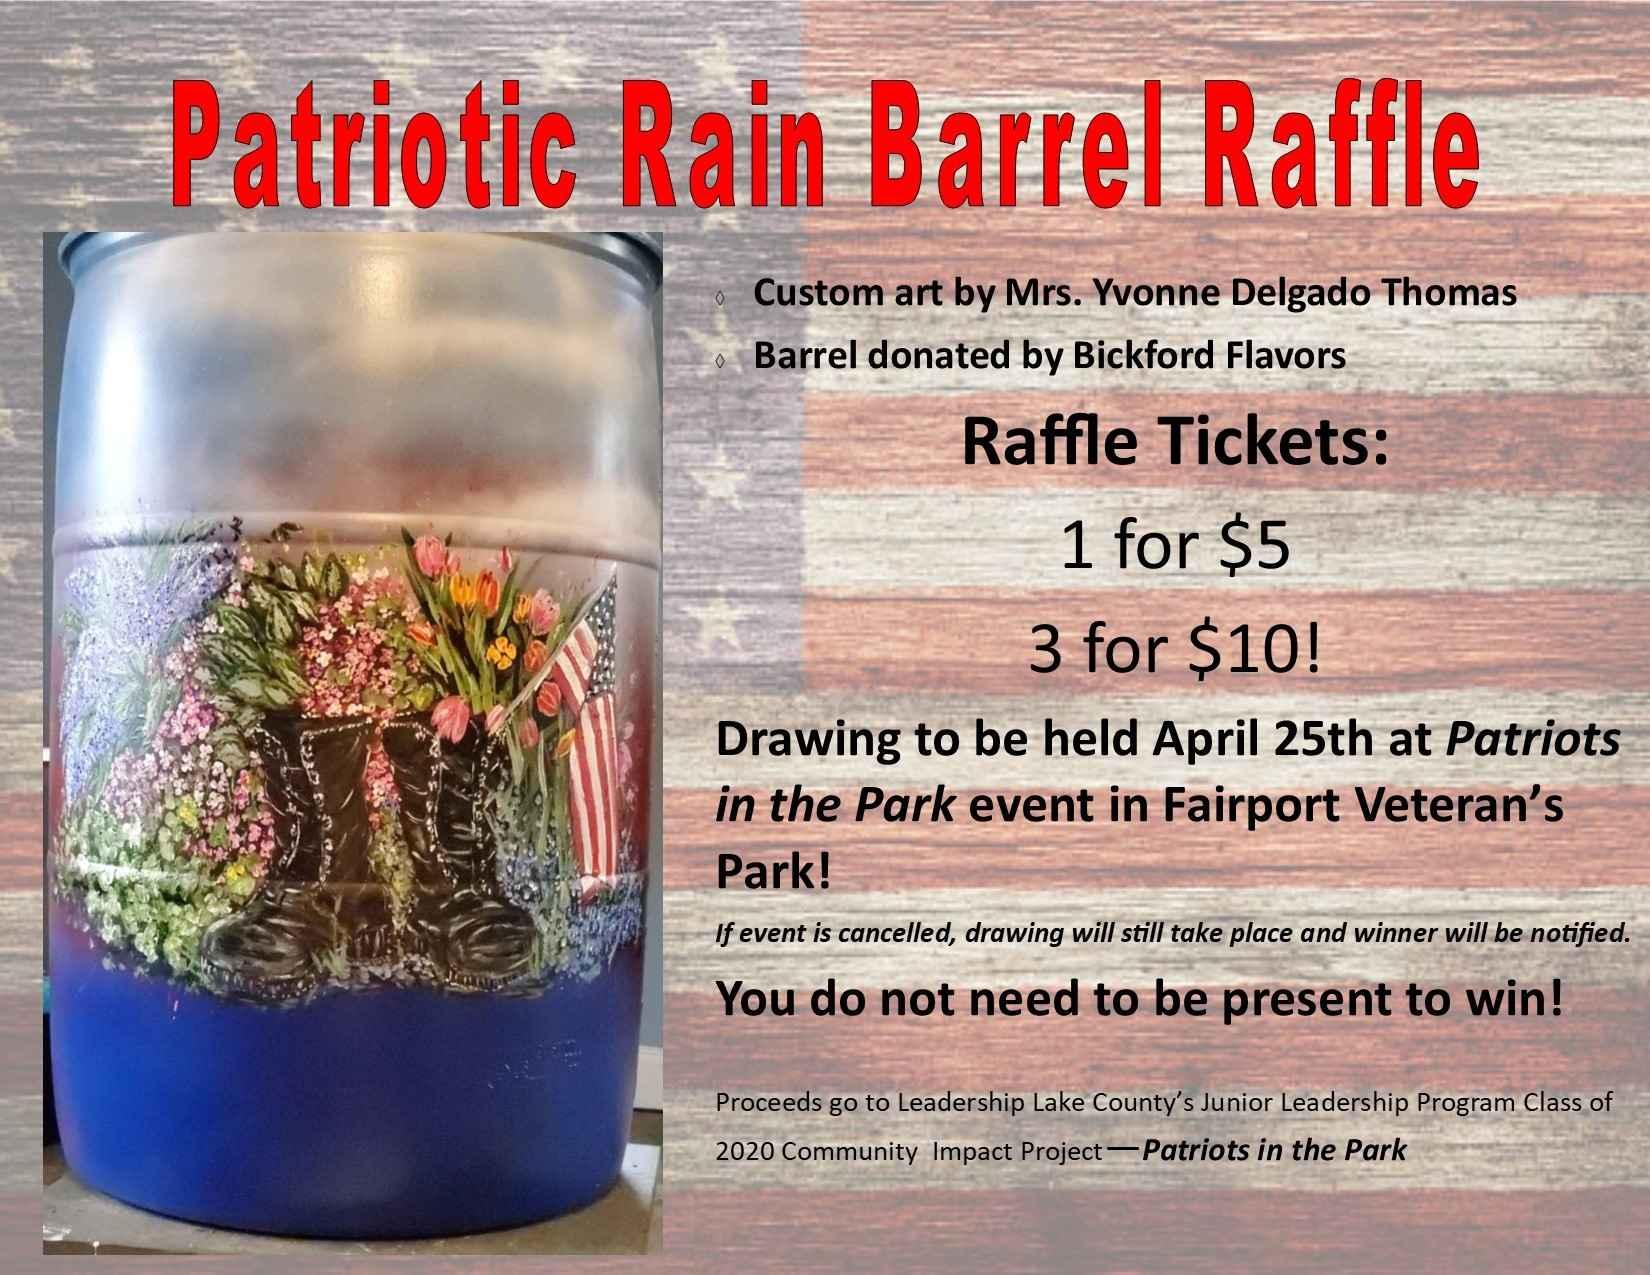 Patriotic Rain Barrel Raffle image